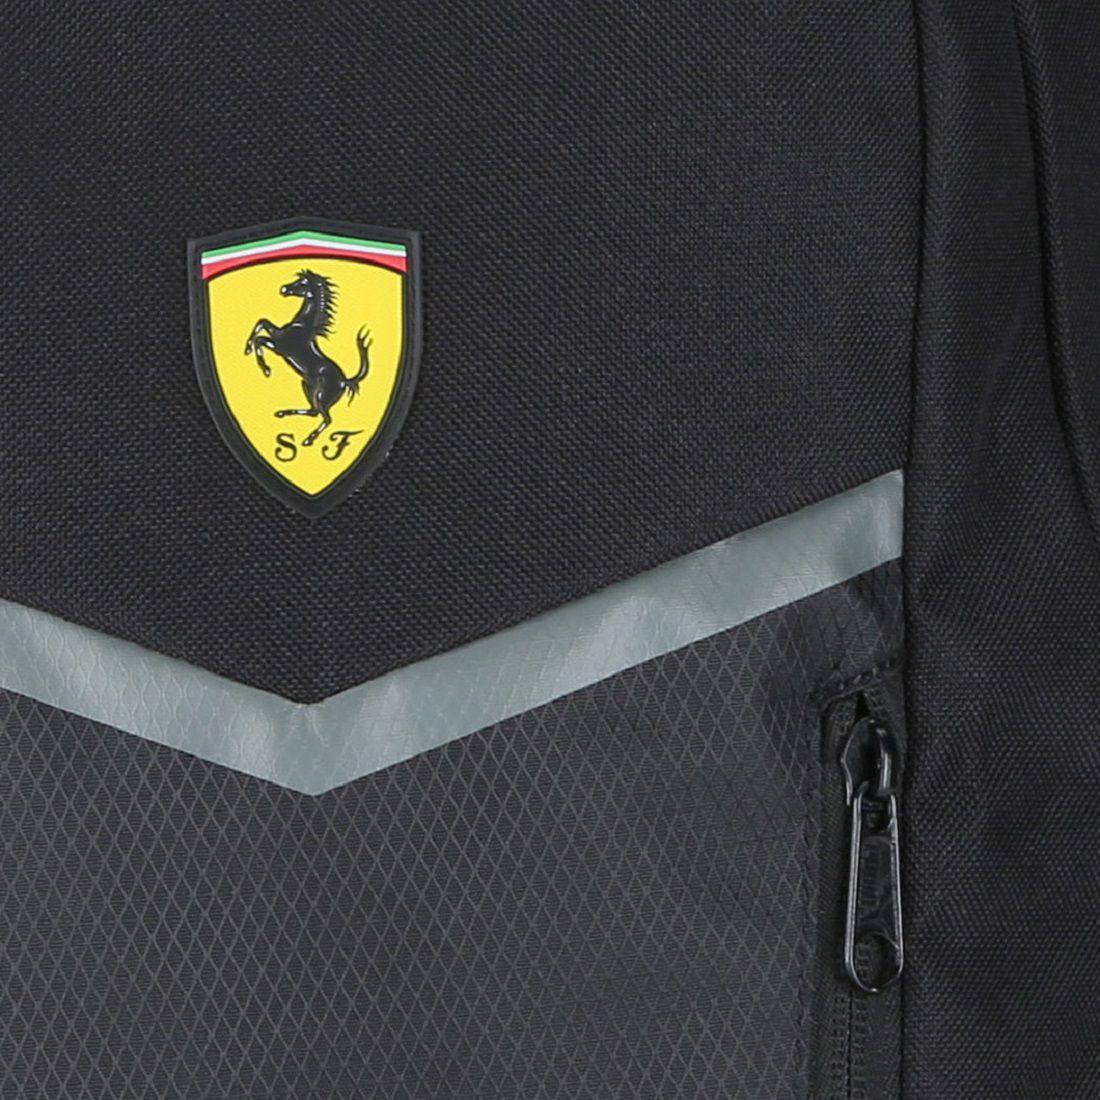 d25ae1fc28da Puma Black Ferrari Fanwear Backpack - Buy Puma Black Ferrari Fanwear ...